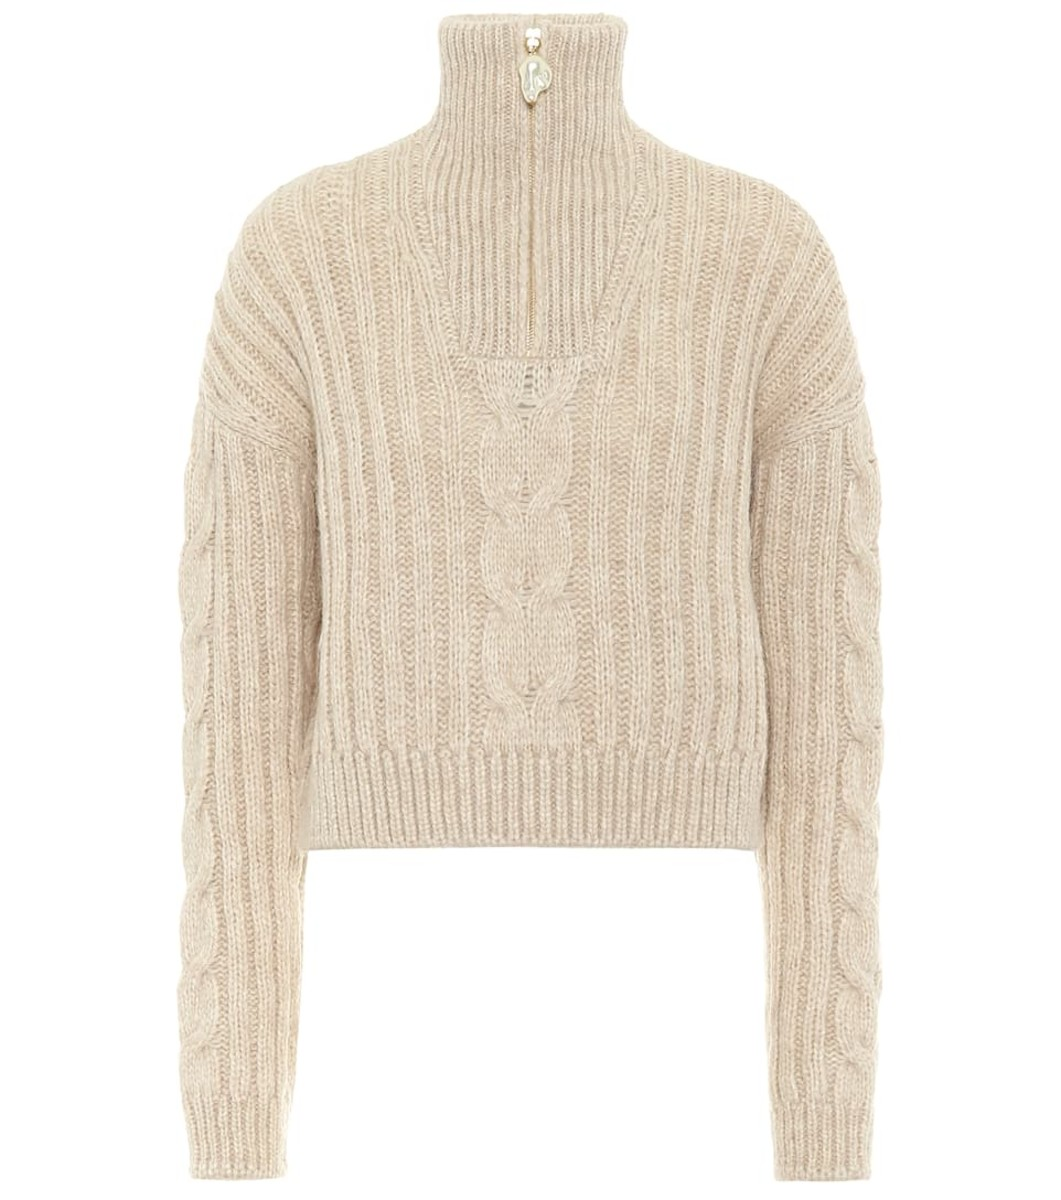 Nanushka Eria Wool-Blend Turtleneck Sweater, $395, available here.